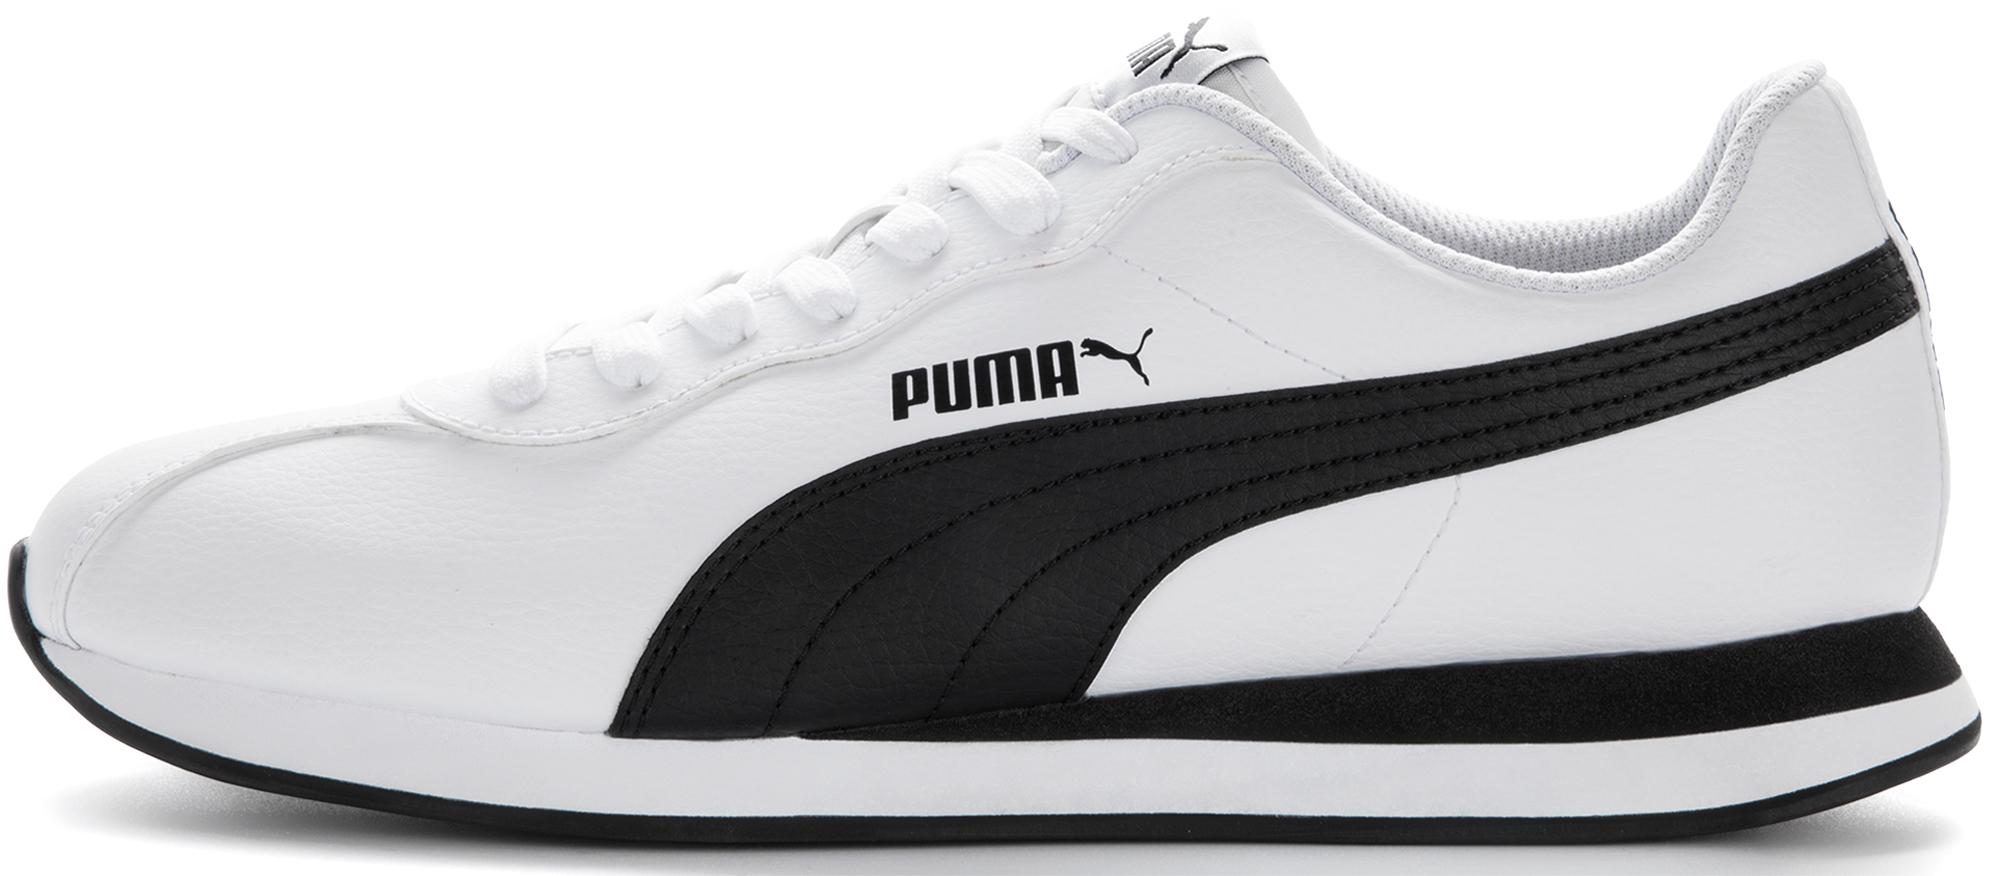 Puma Кроссовки мужские Puma Turin II, размер 45